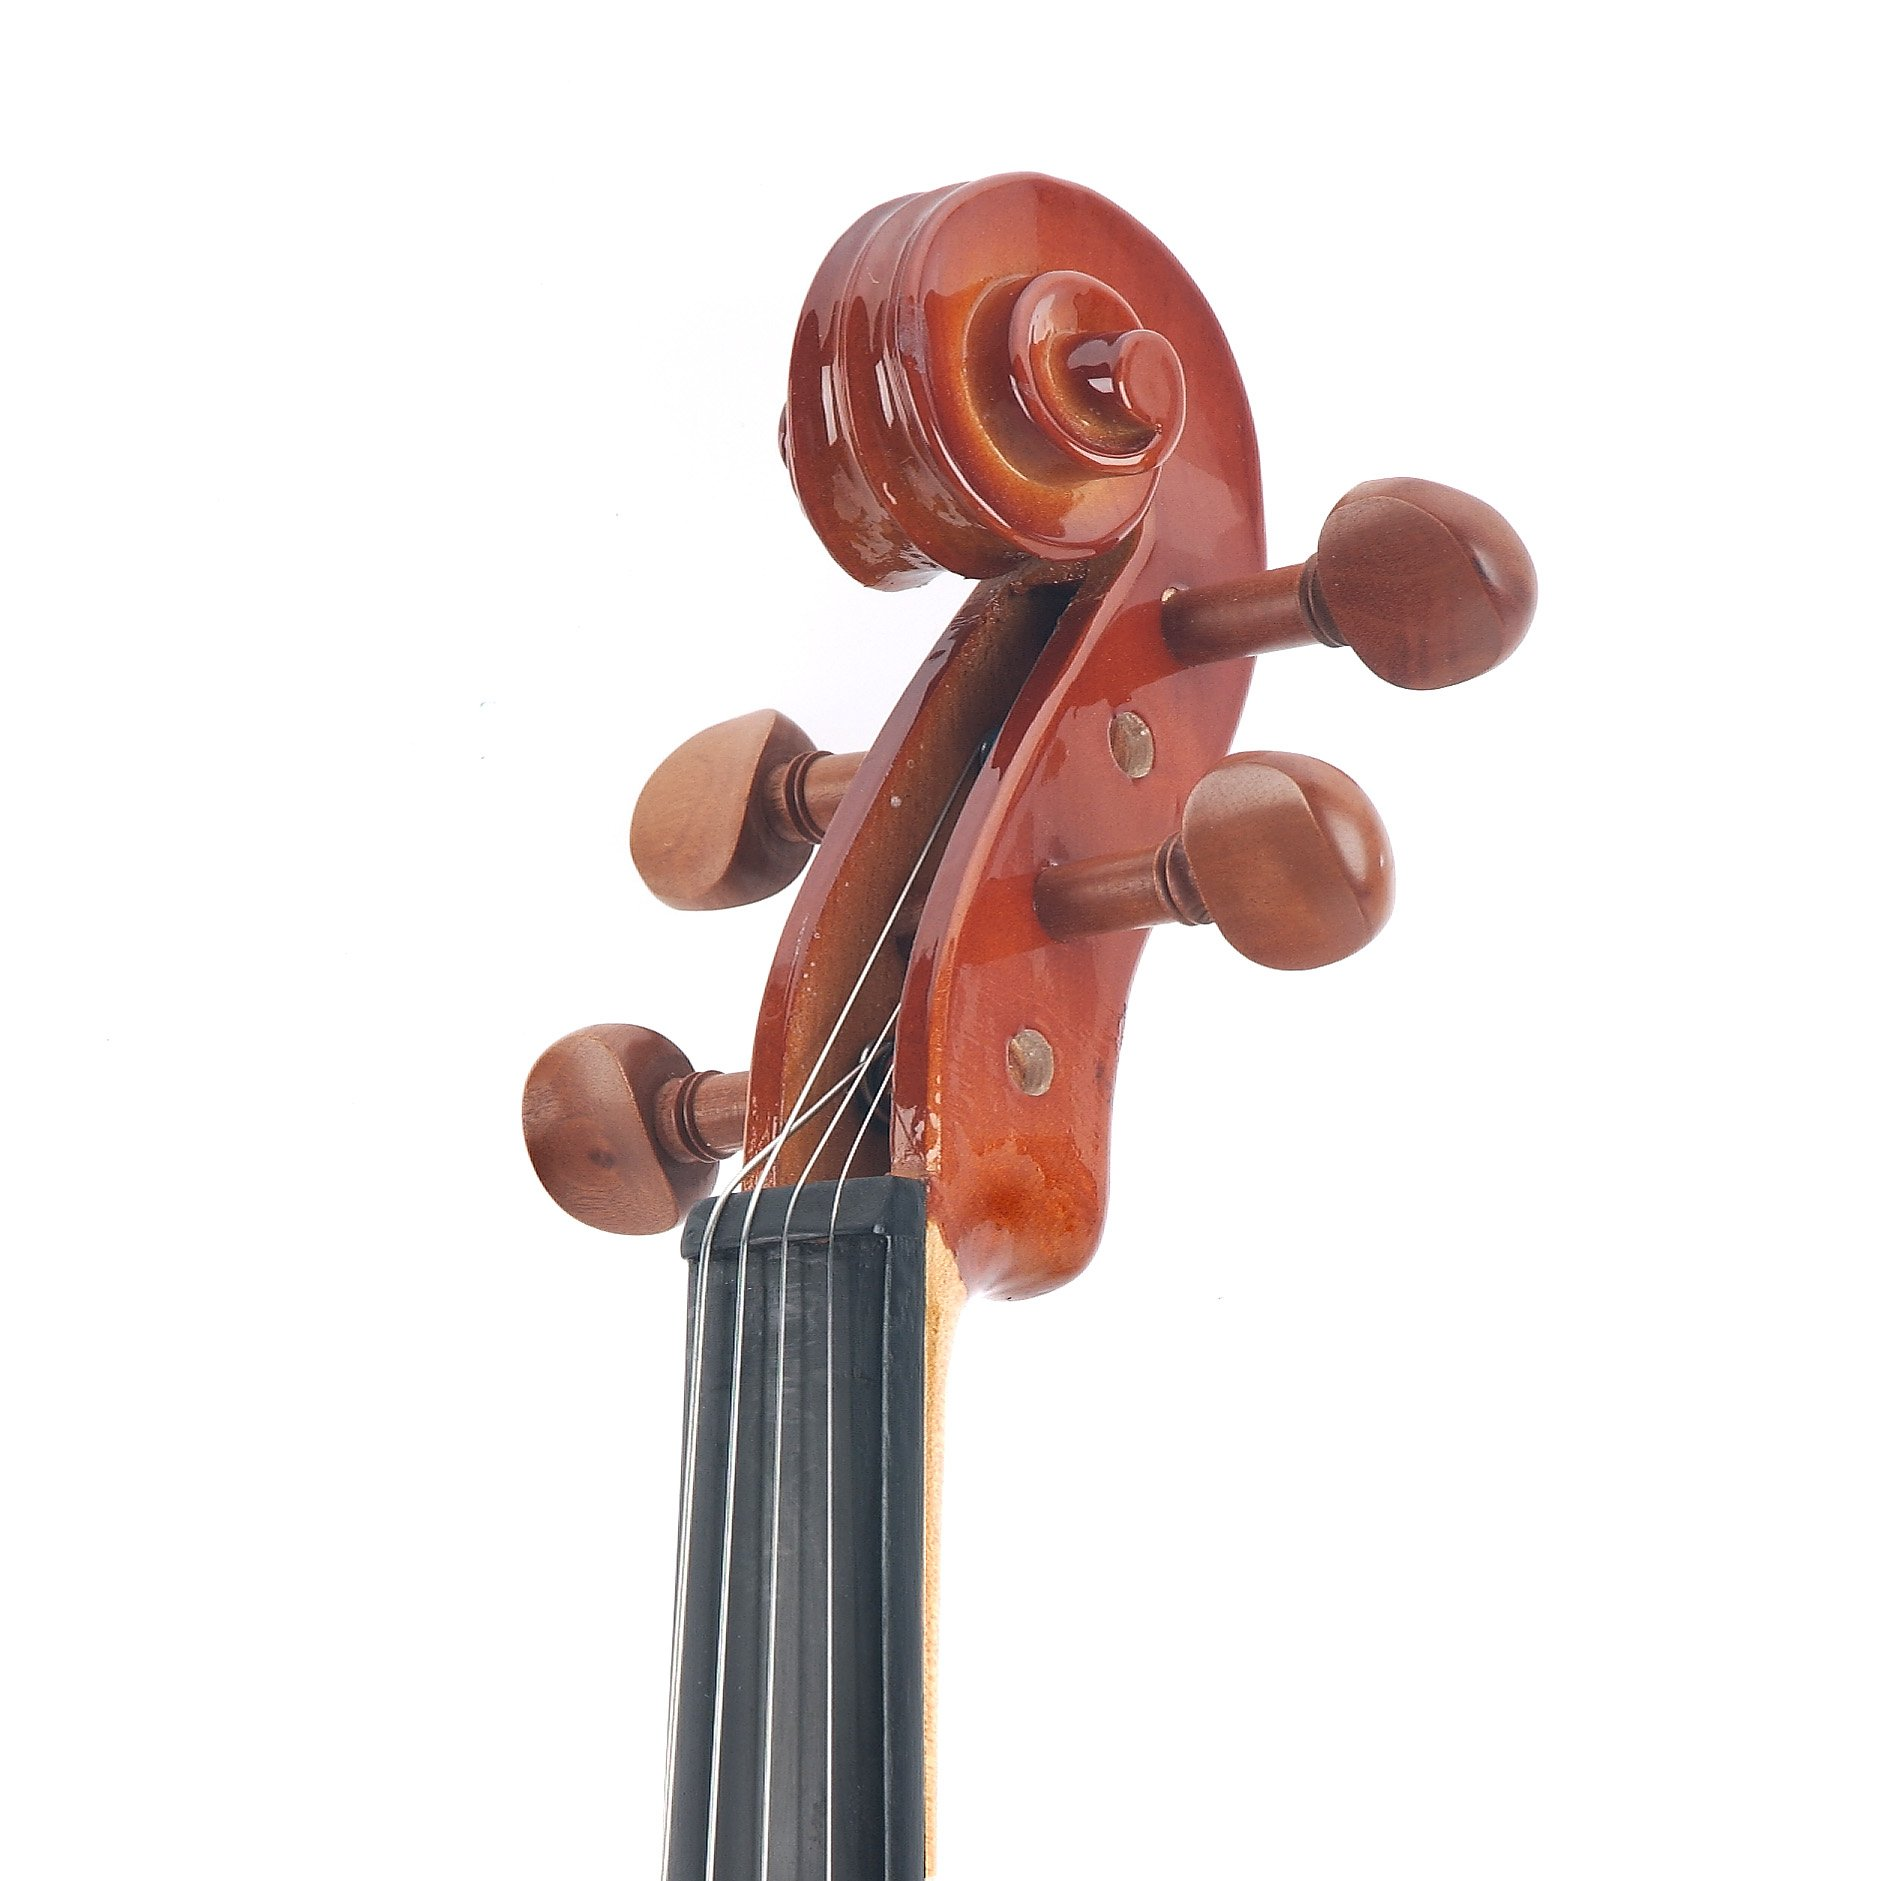 Cecilio CVN-200 Solidwood Violin with D'Addario Prelude Strings, Size 4/4 (Full Size) by Cecilio (Image #7)